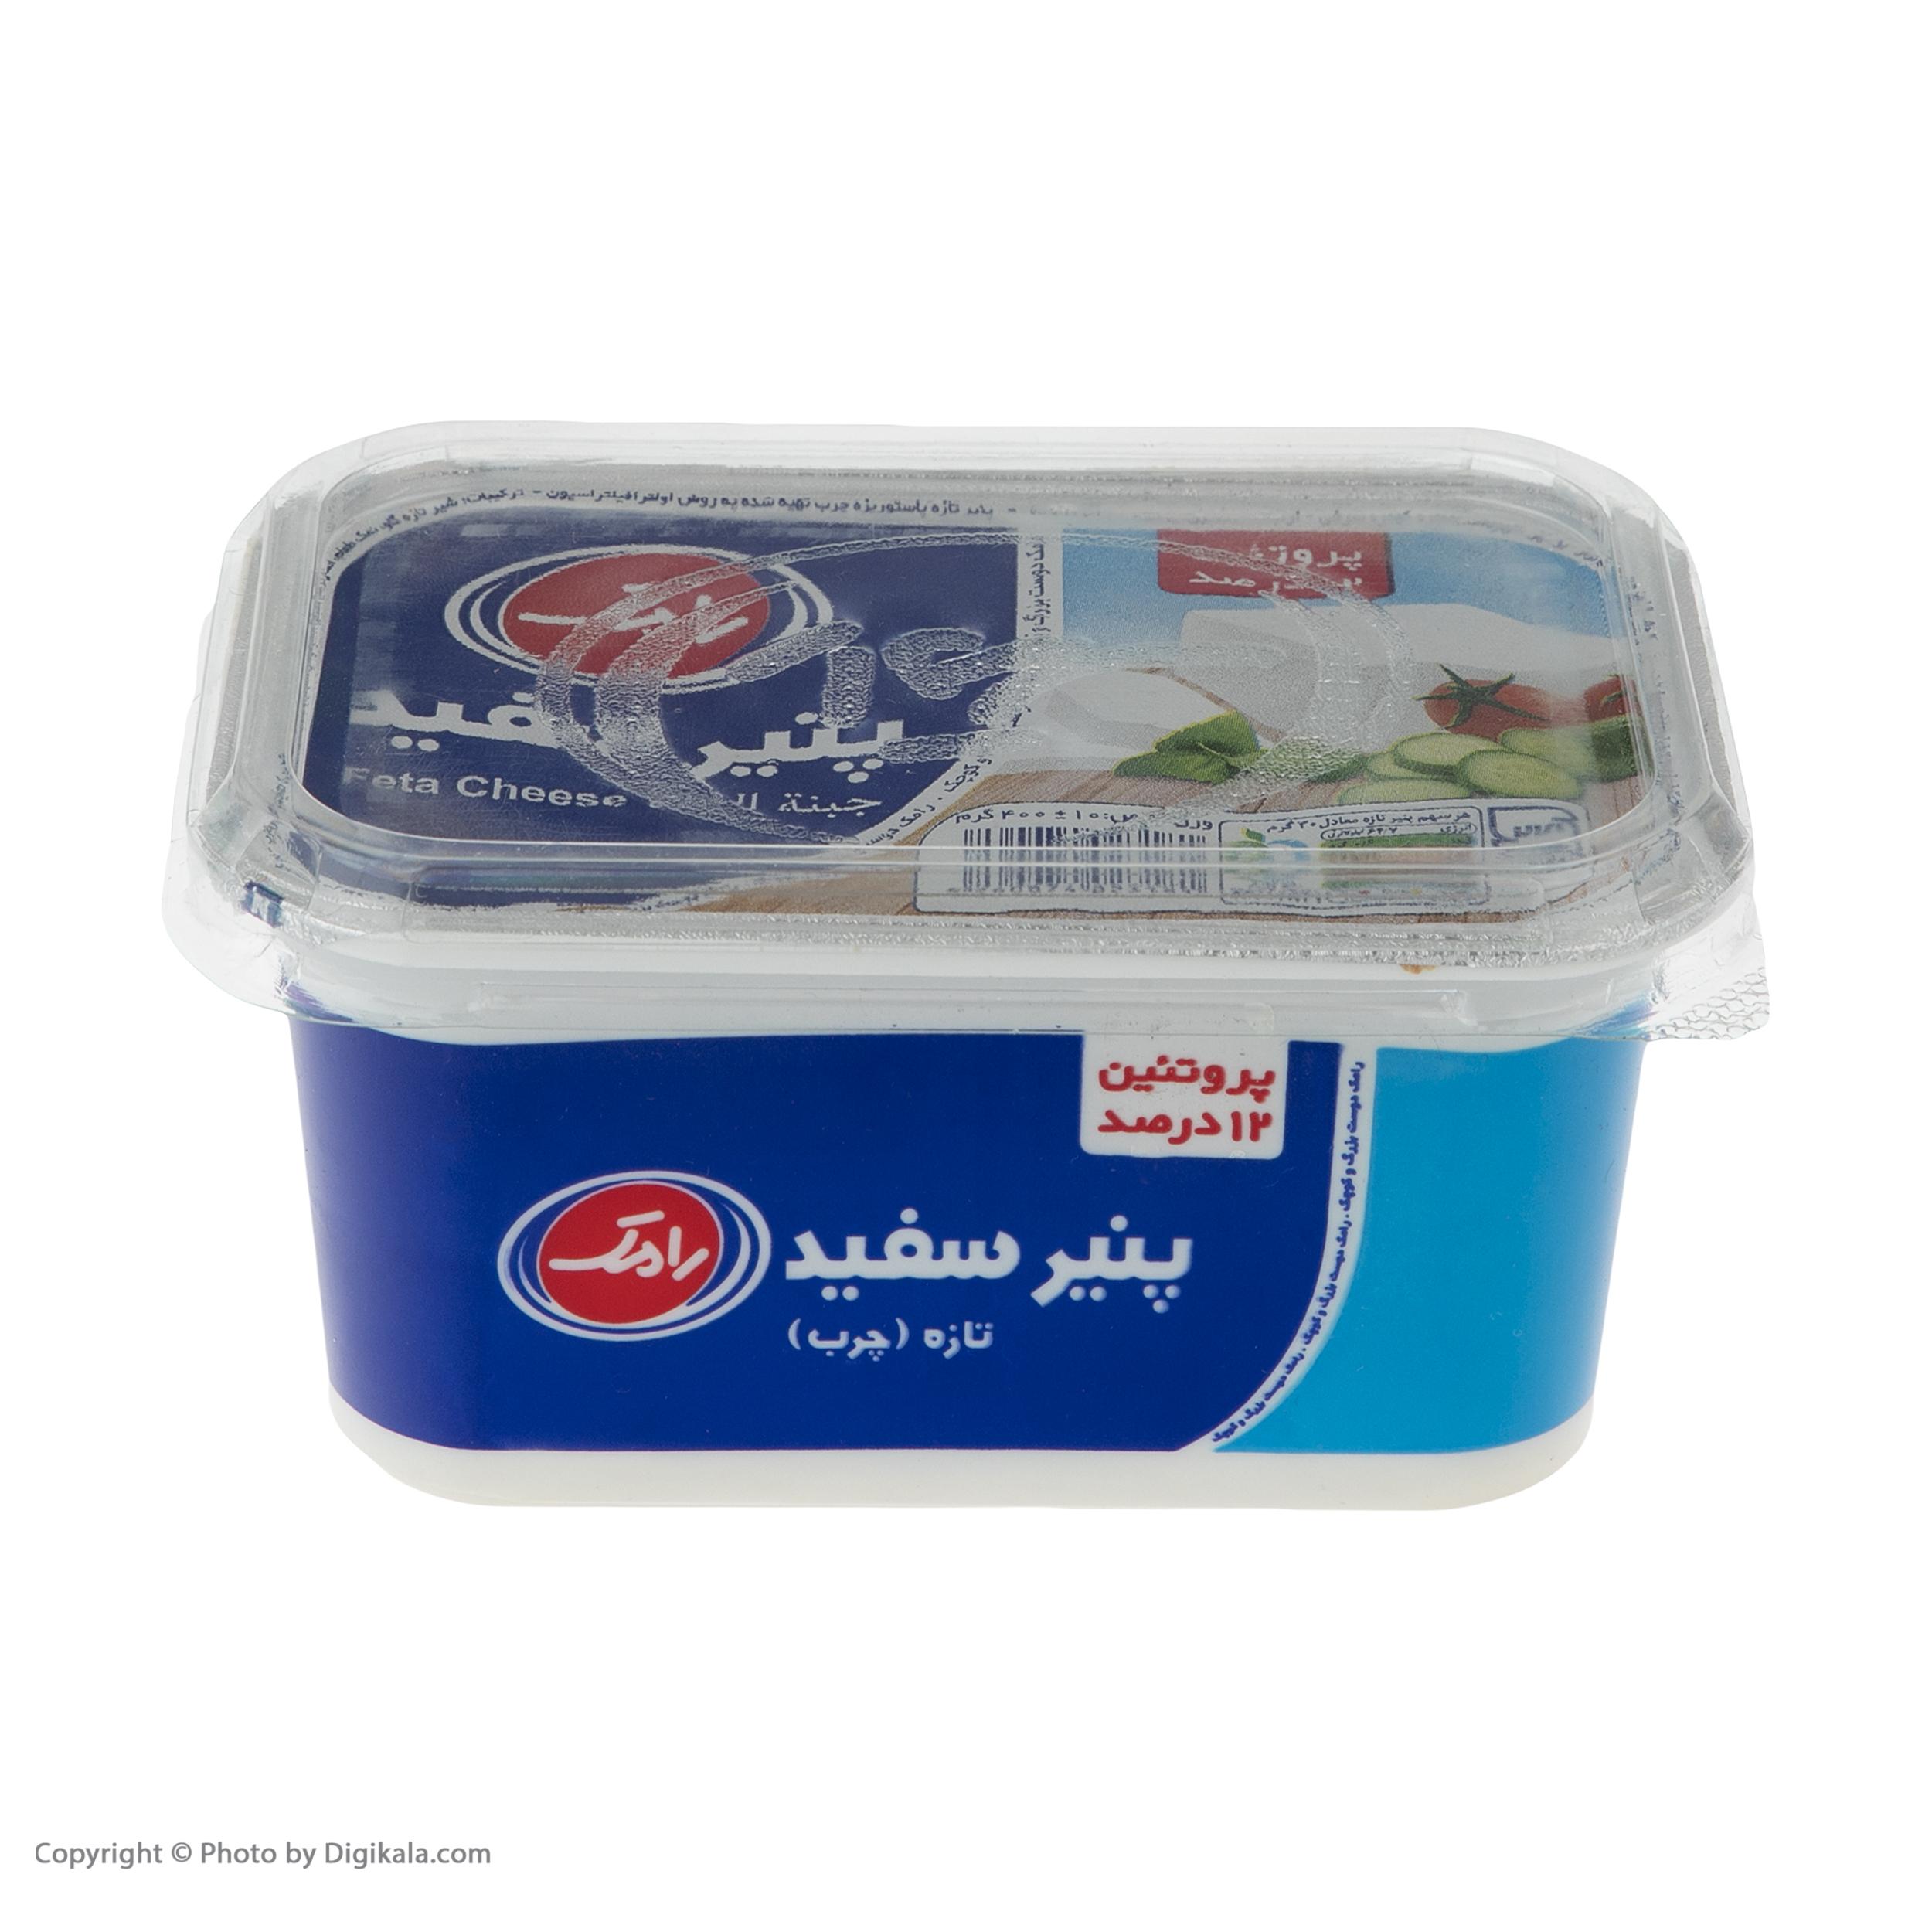 پنیر سفید رامک وزن 400 گرم main 1 2